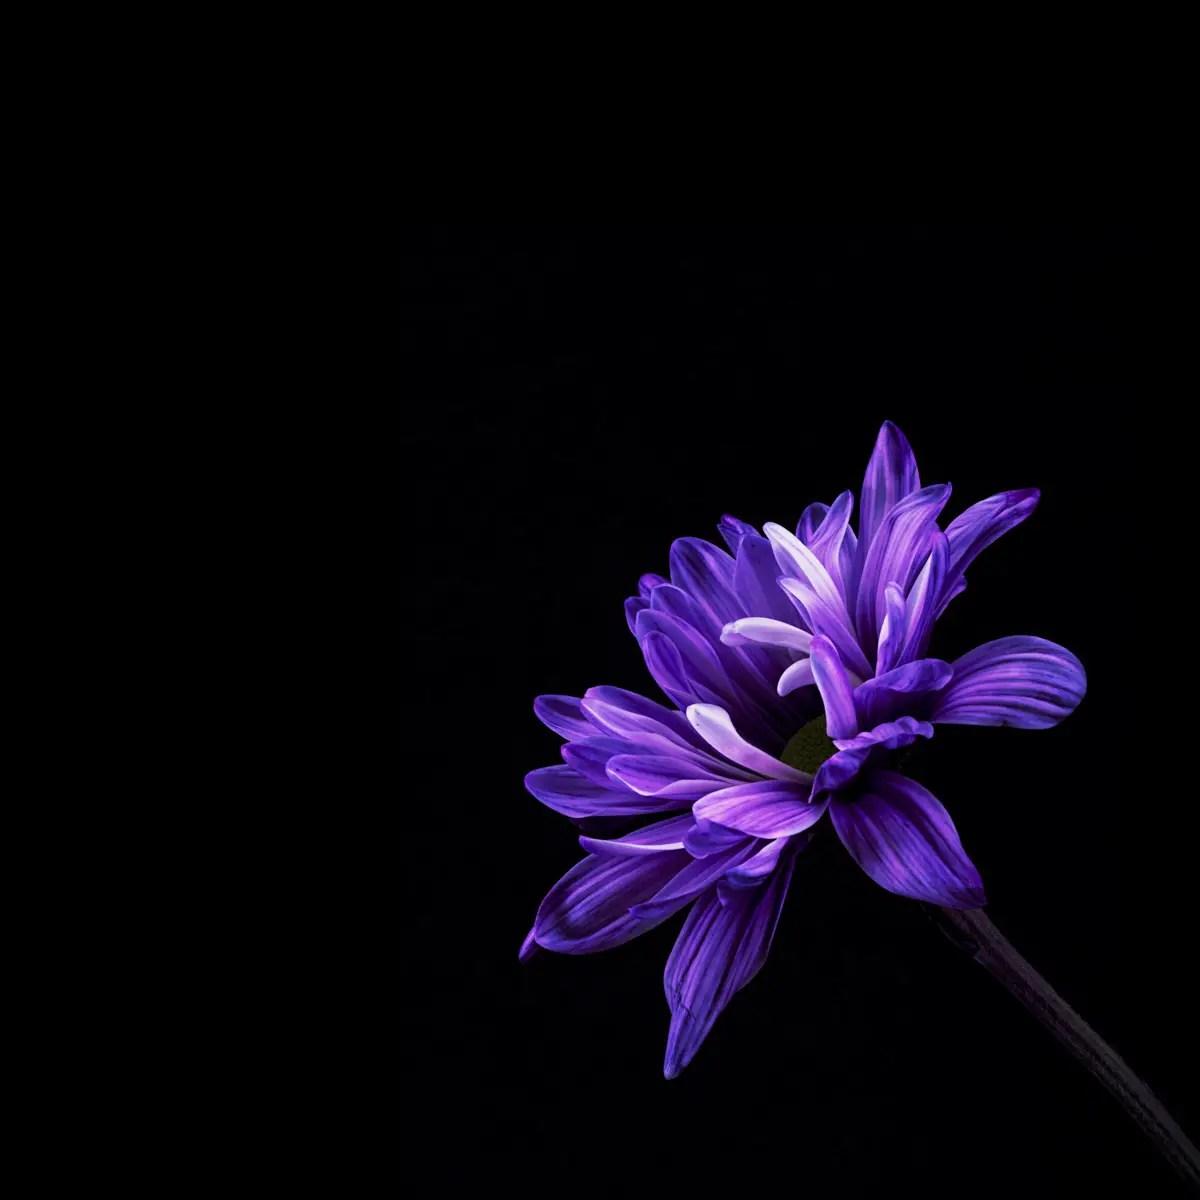 David Hancock - Flower (29) B SQ